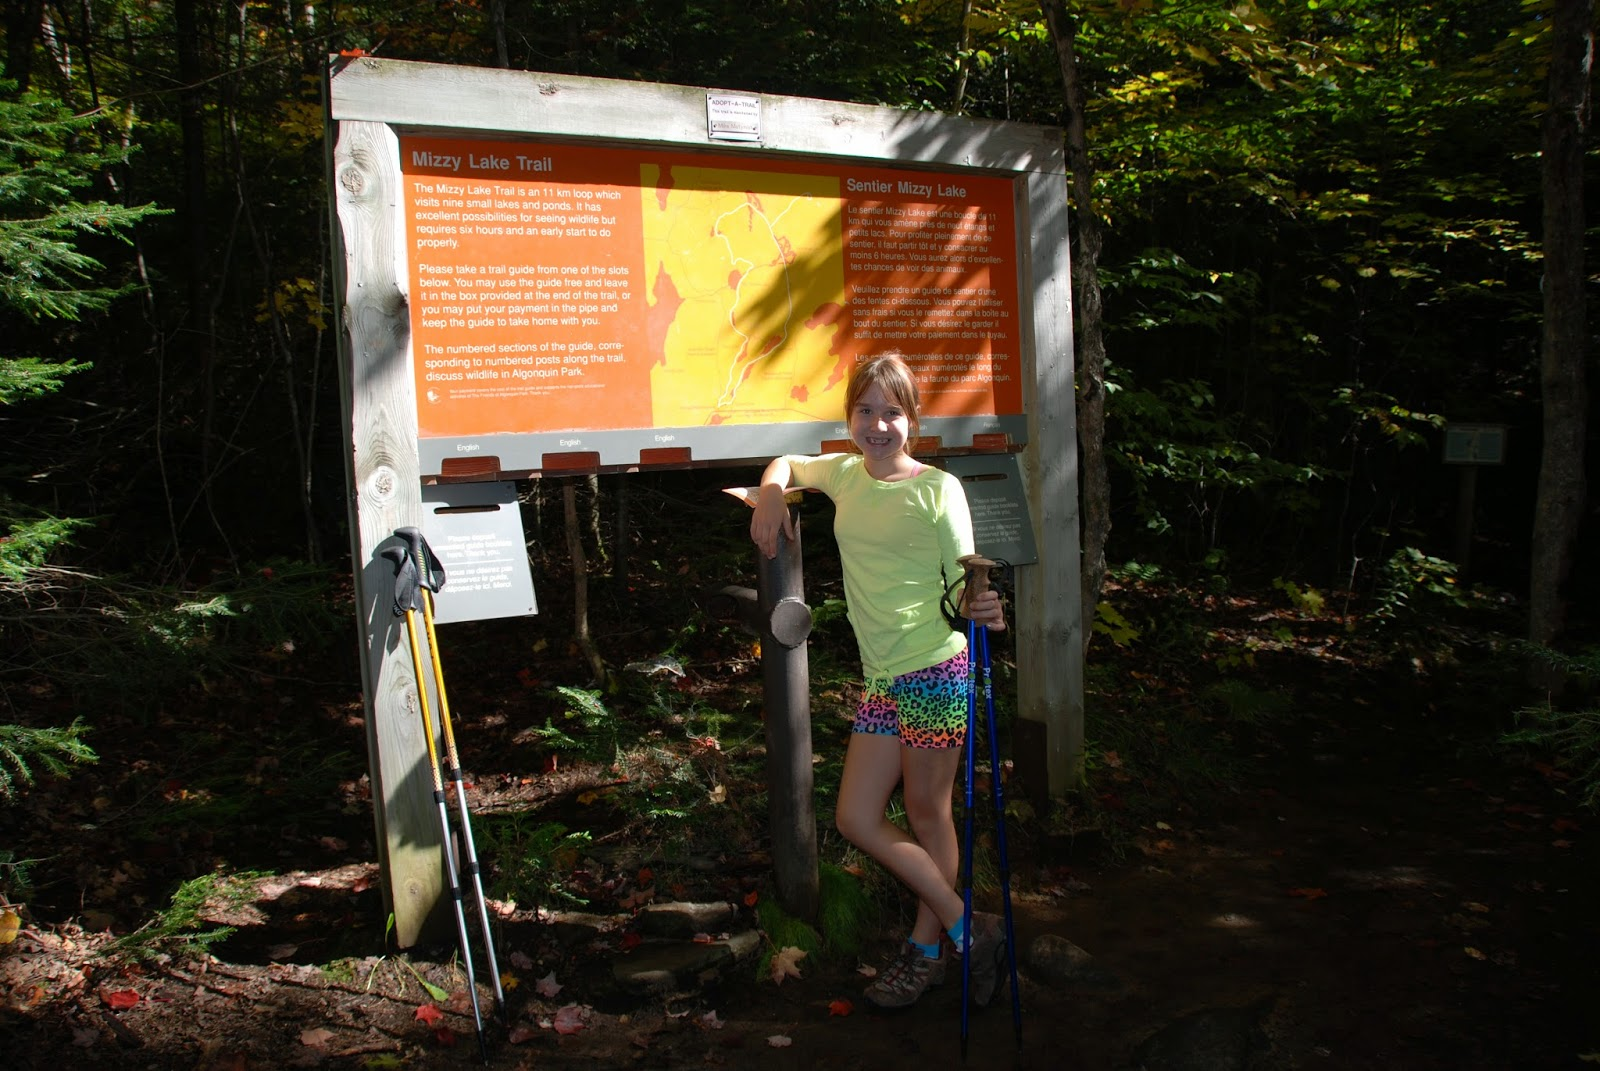 Trailhead sign at Mizzy Lake Trail